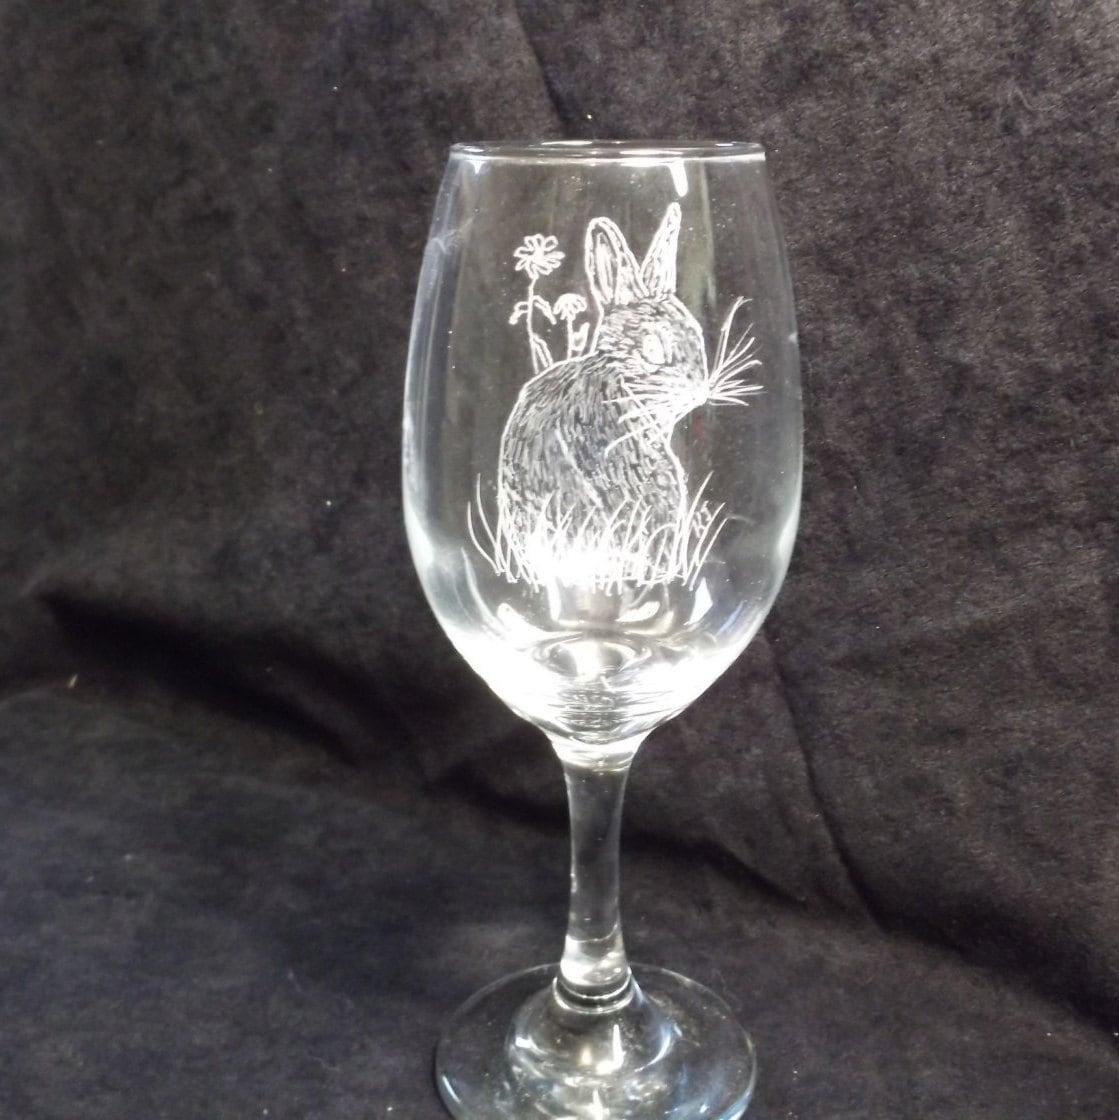 whimsical engraved bunny wine glass engraved rabbit on wine glass etched rabbit on wine glass. Black Bedroom Furniture Sets. Home Design Ideas